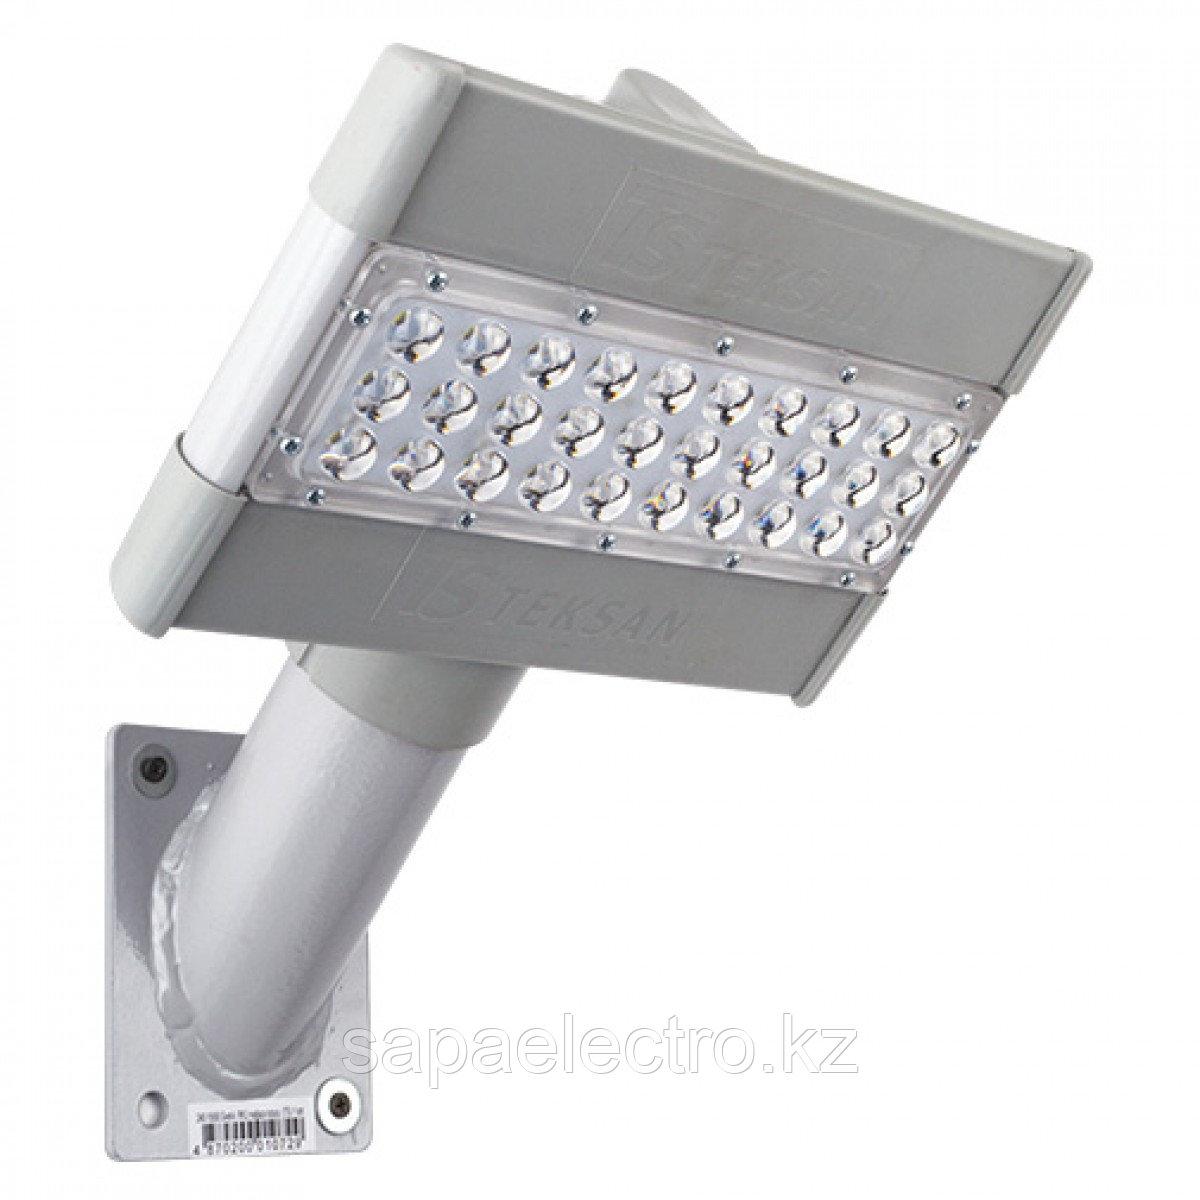 Свет-к RKU LED SMART 1*30W (3года гарантия)6000K IP